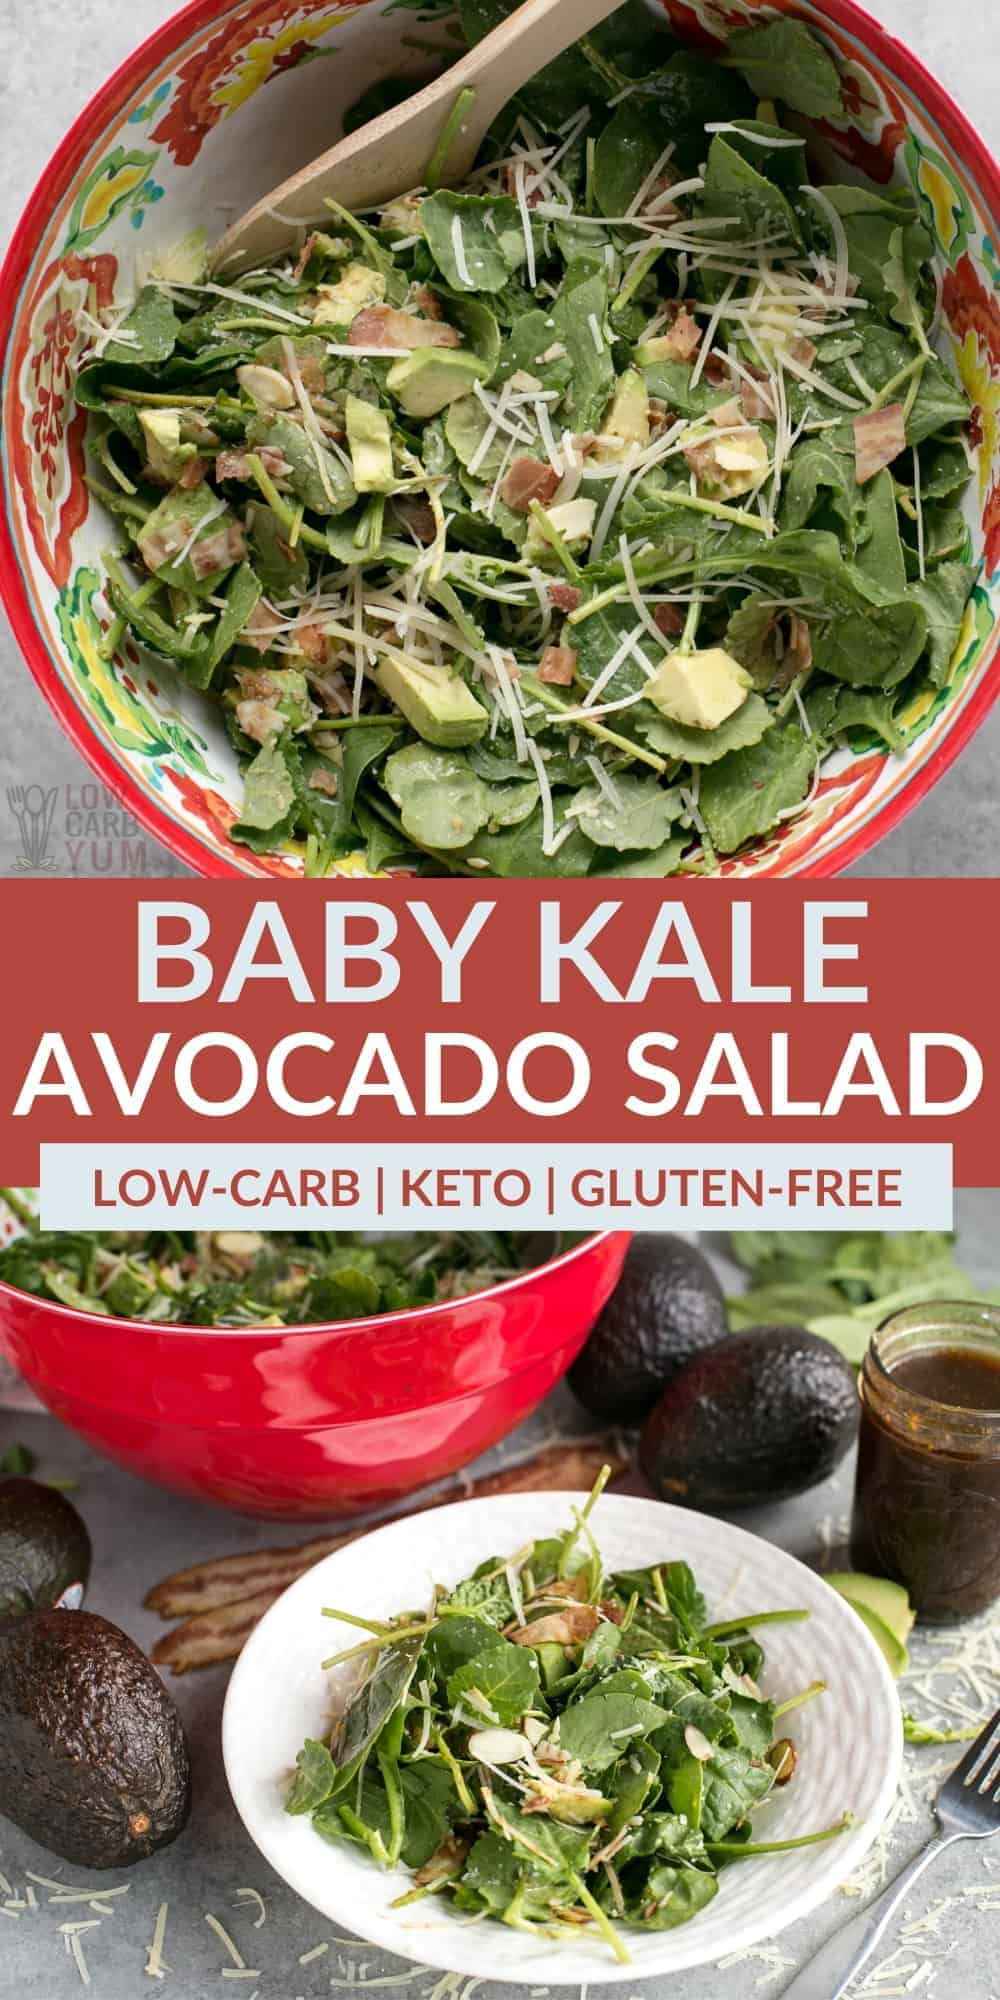 baby kale avocado salad pinterst image